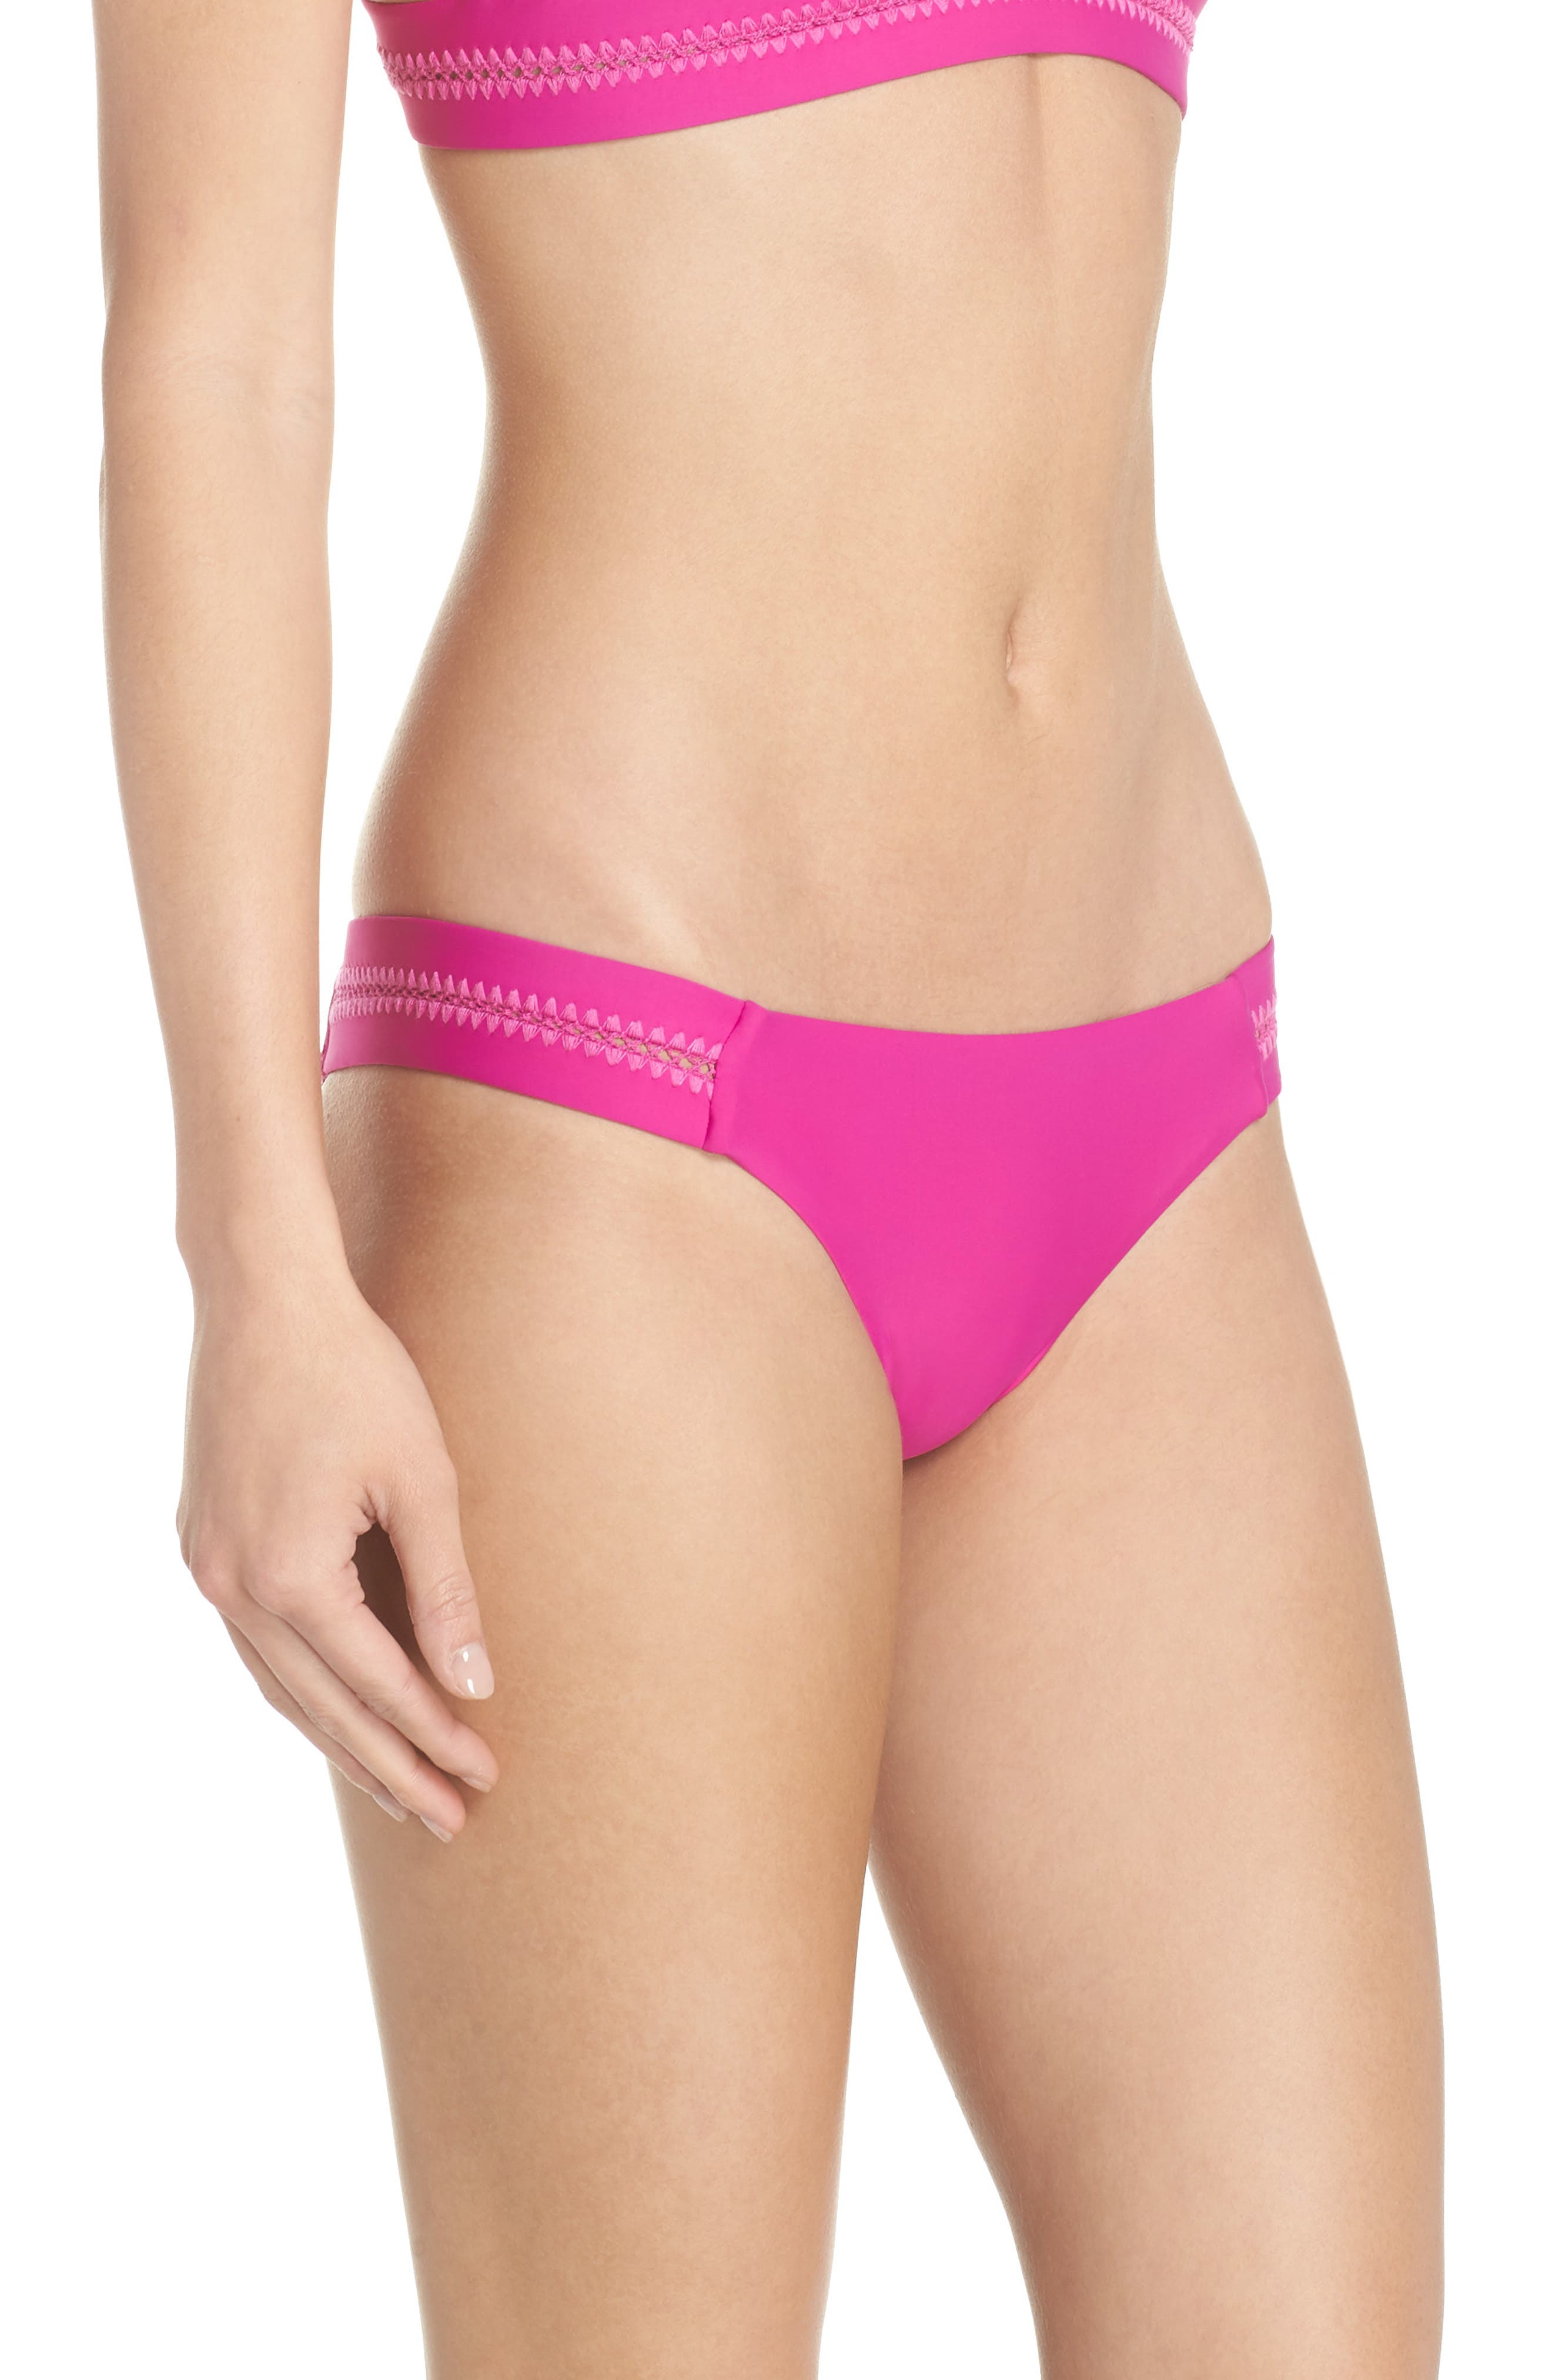 Teeny Stitched Bikini Bottoms,                             Alternate thumbnail 3, color,                             652